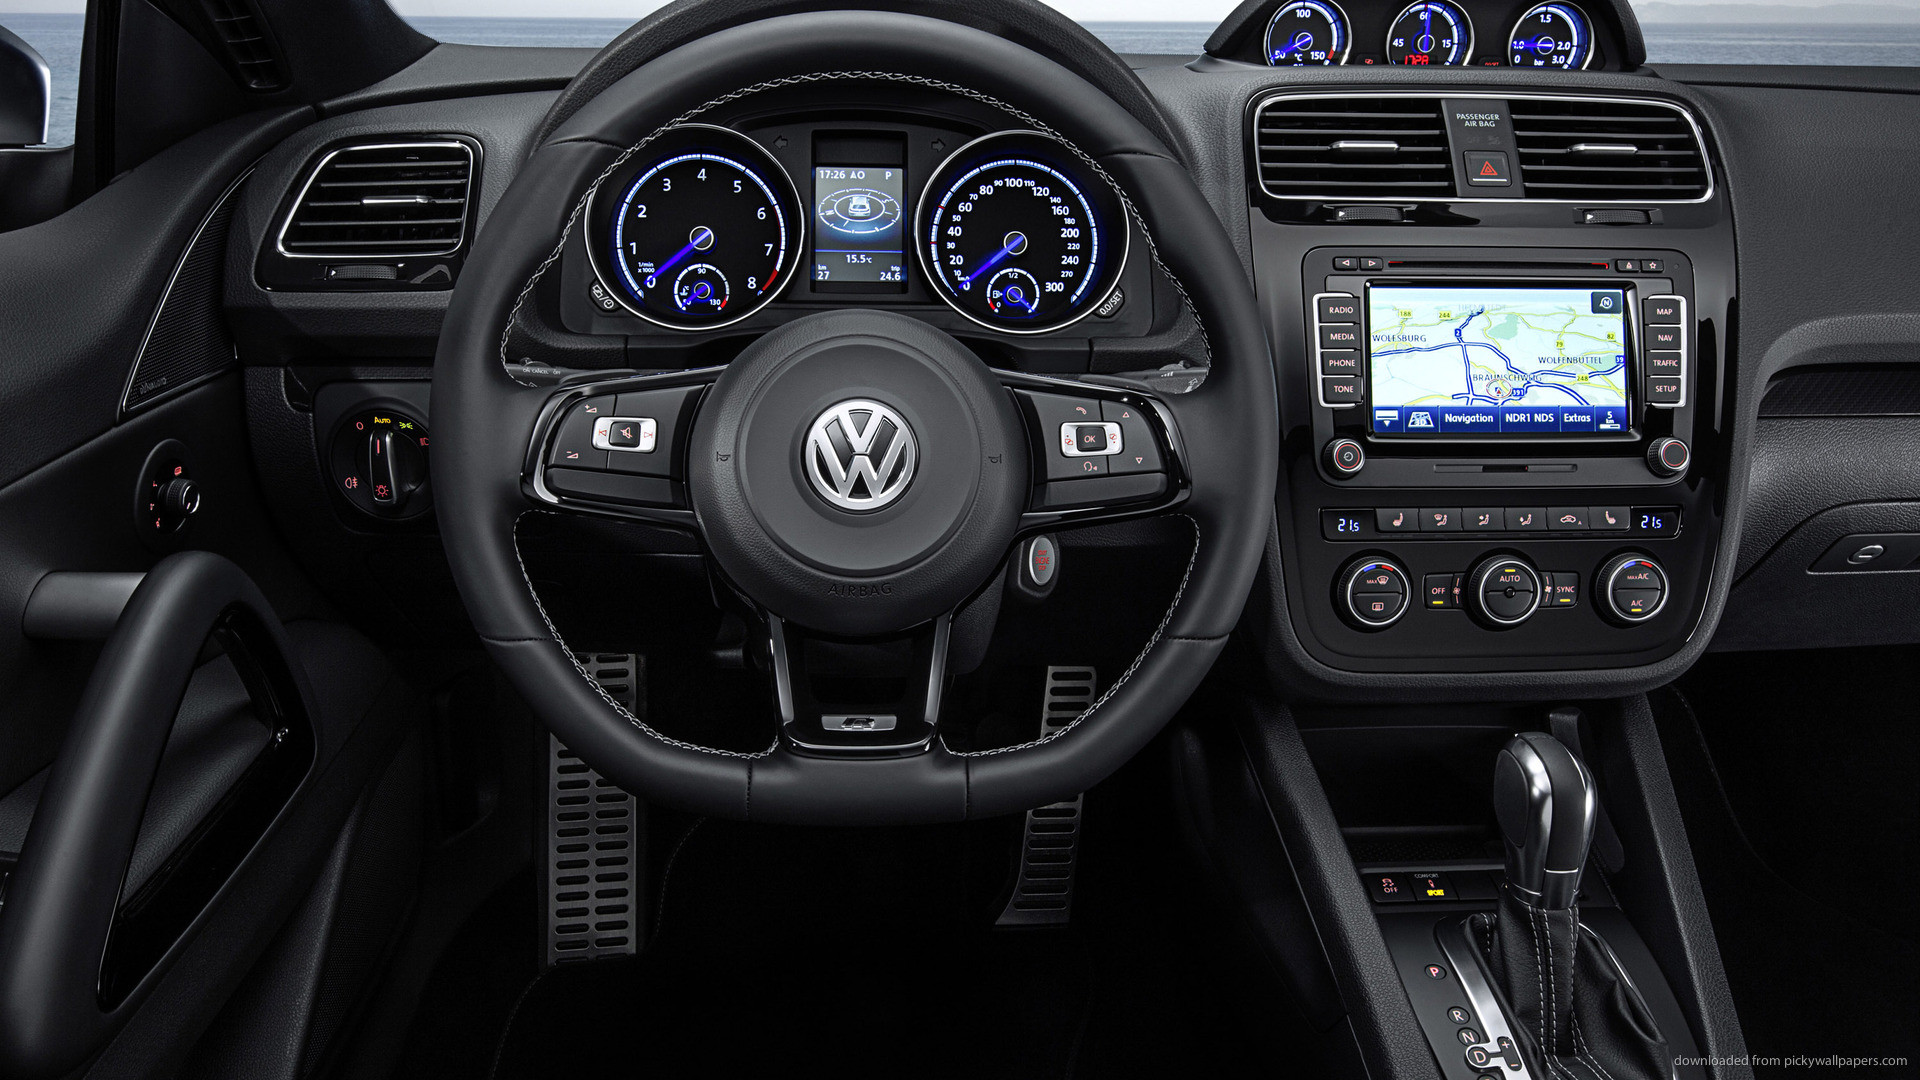 2880x1800 Wonderful Volkswagen Logo Wallpaper   Full HD Pictures